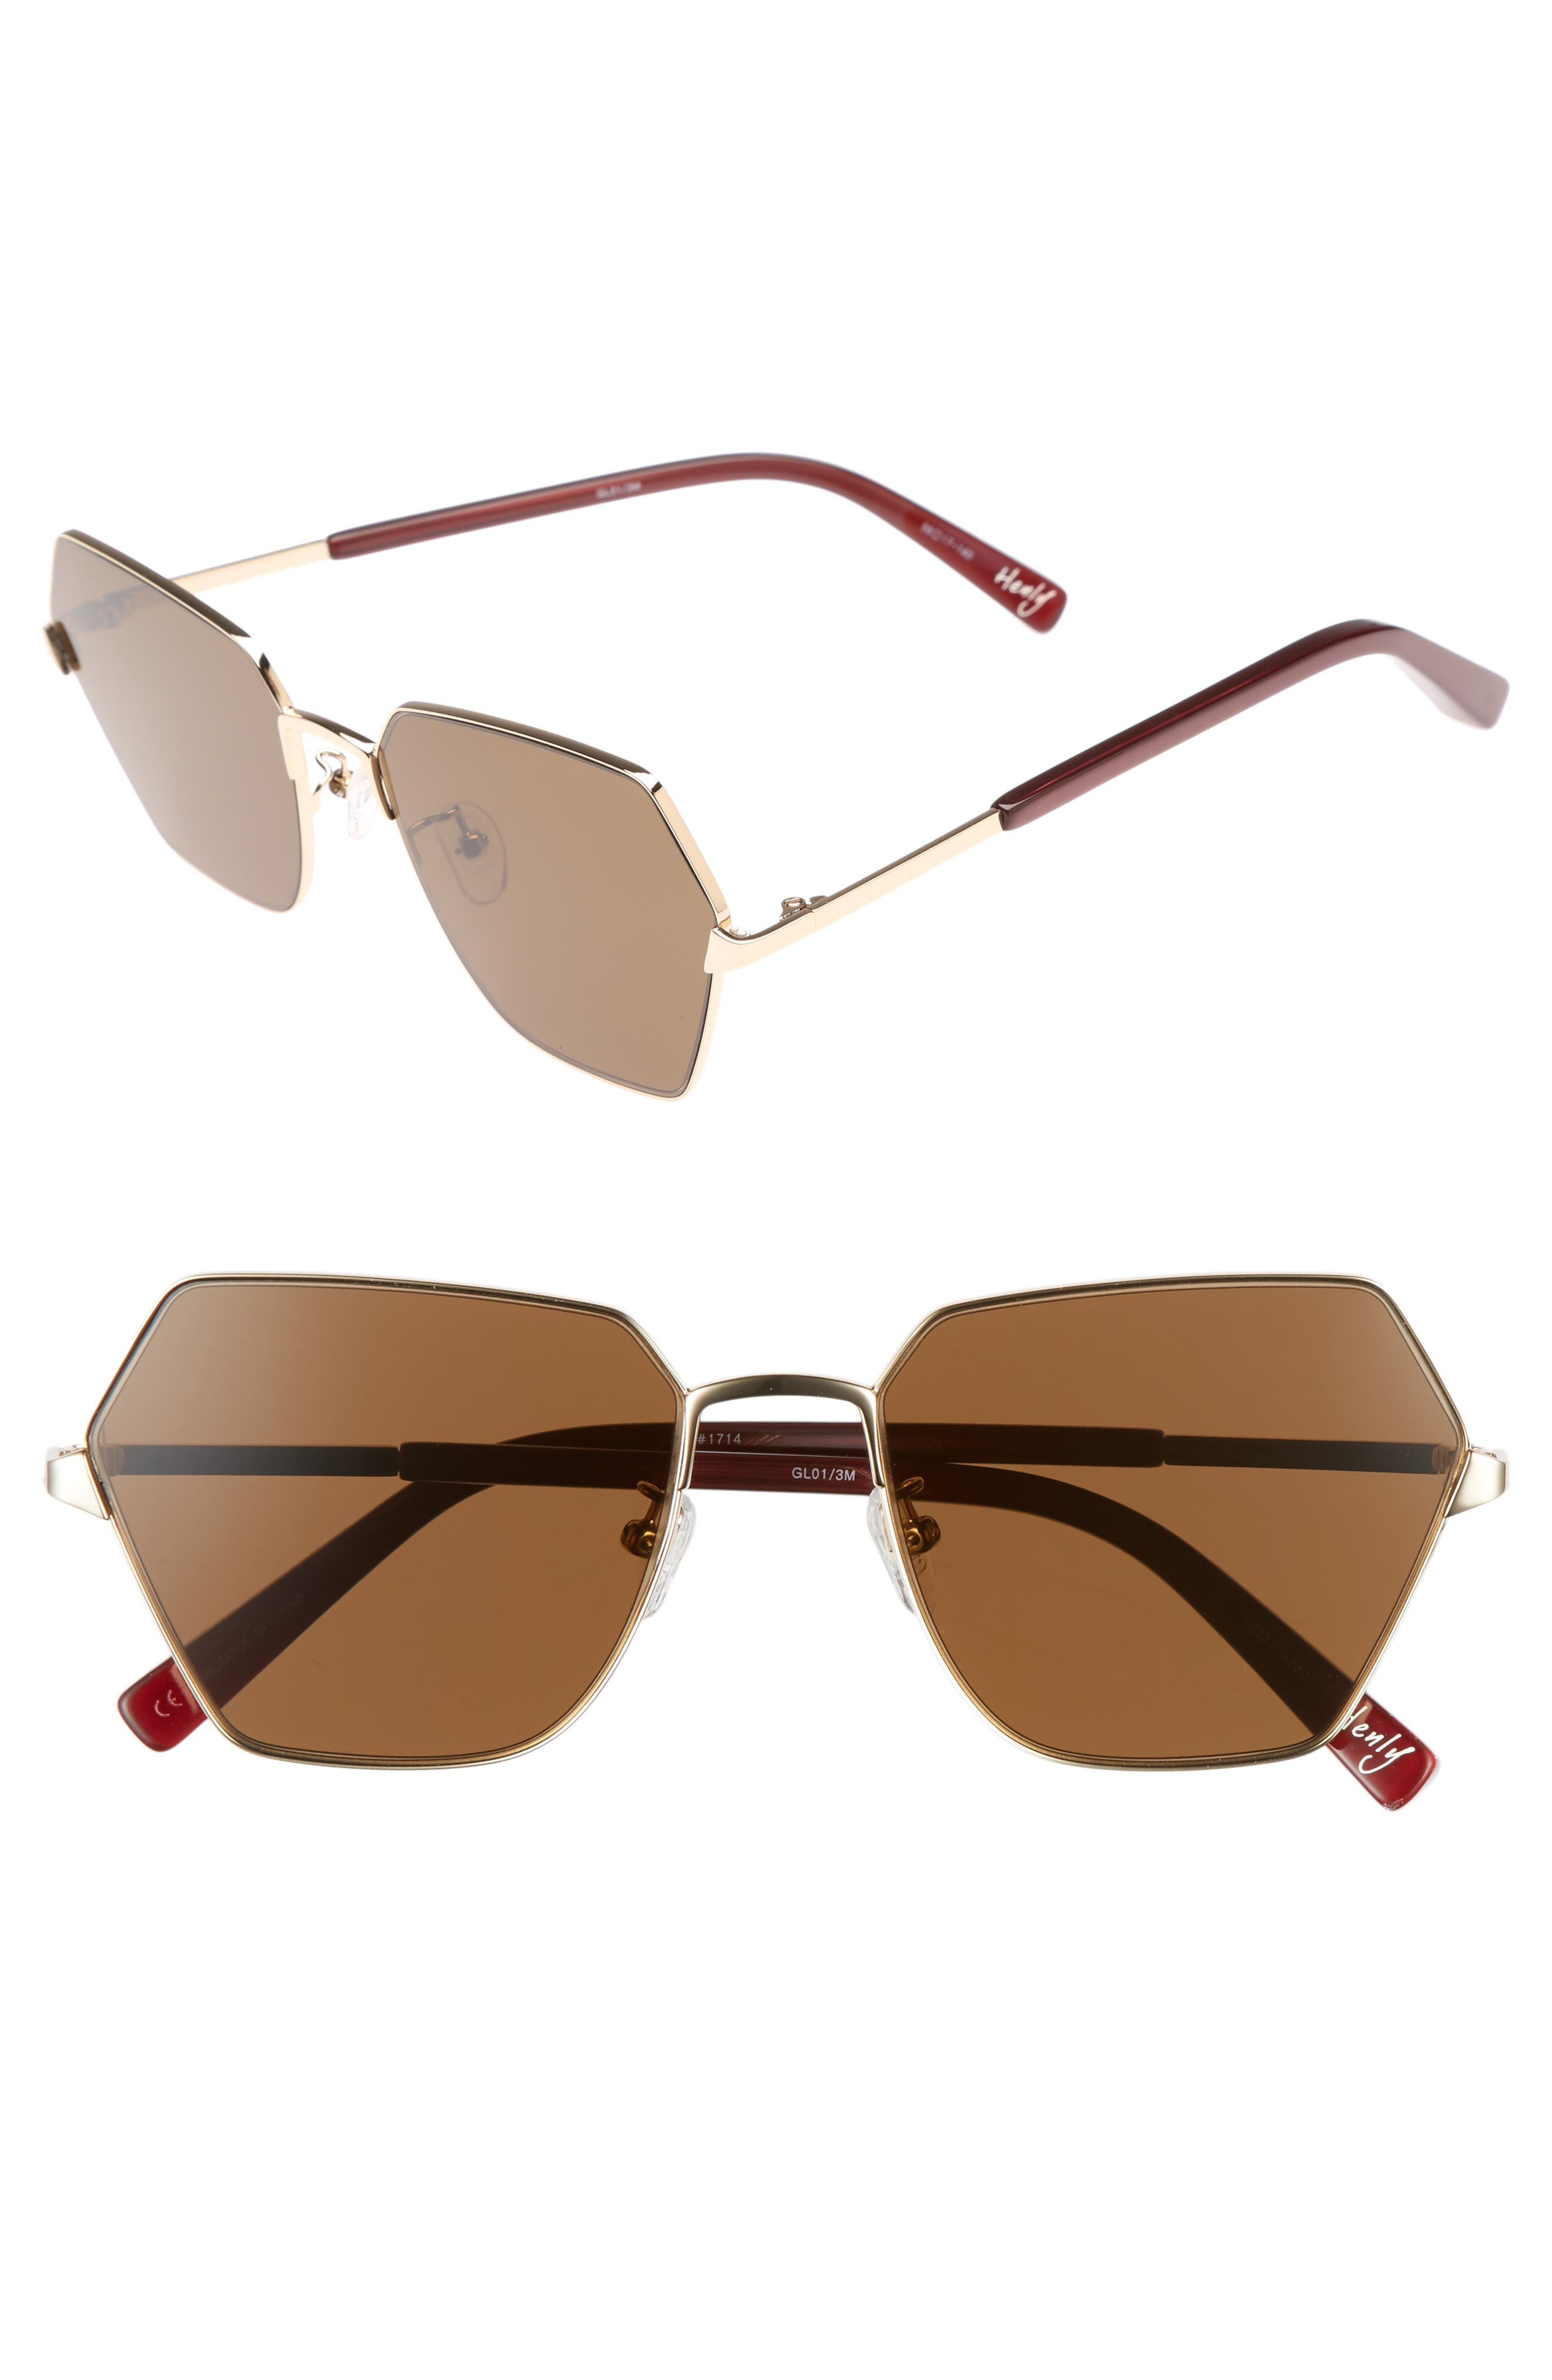 Main Image - Elizabeth and James Henly 56mm Sunglasses